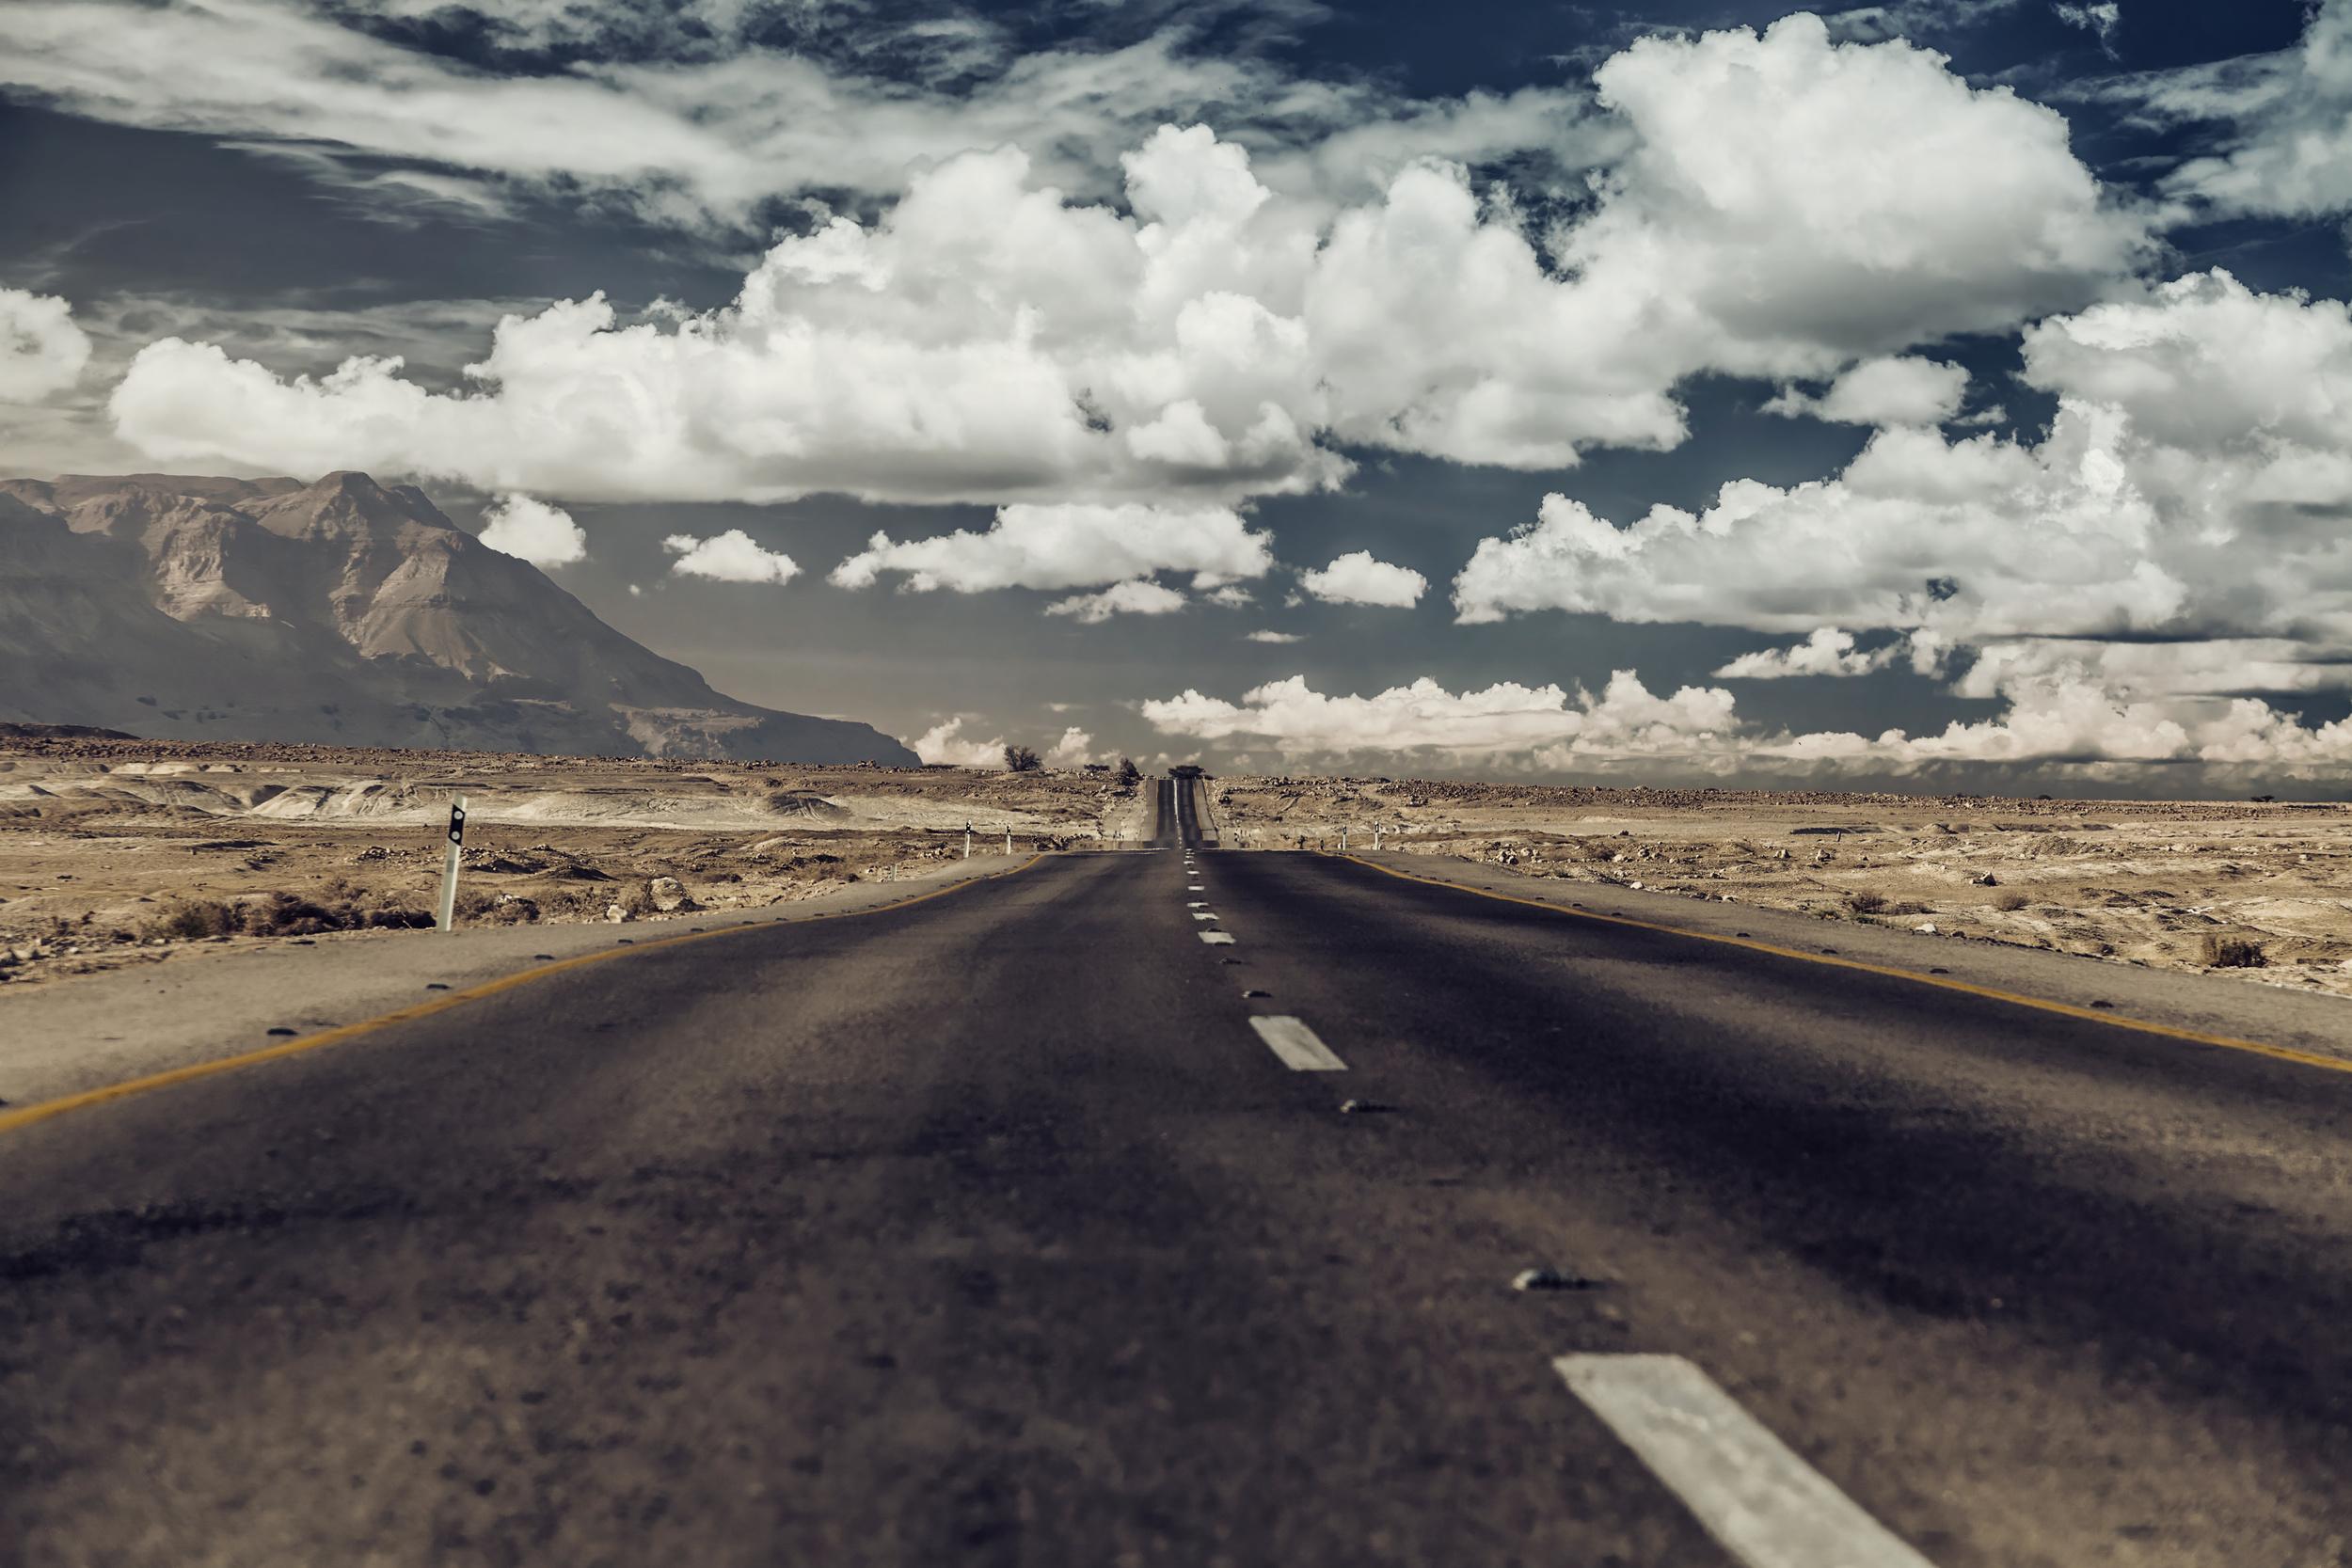 Elijah Stephens Travel